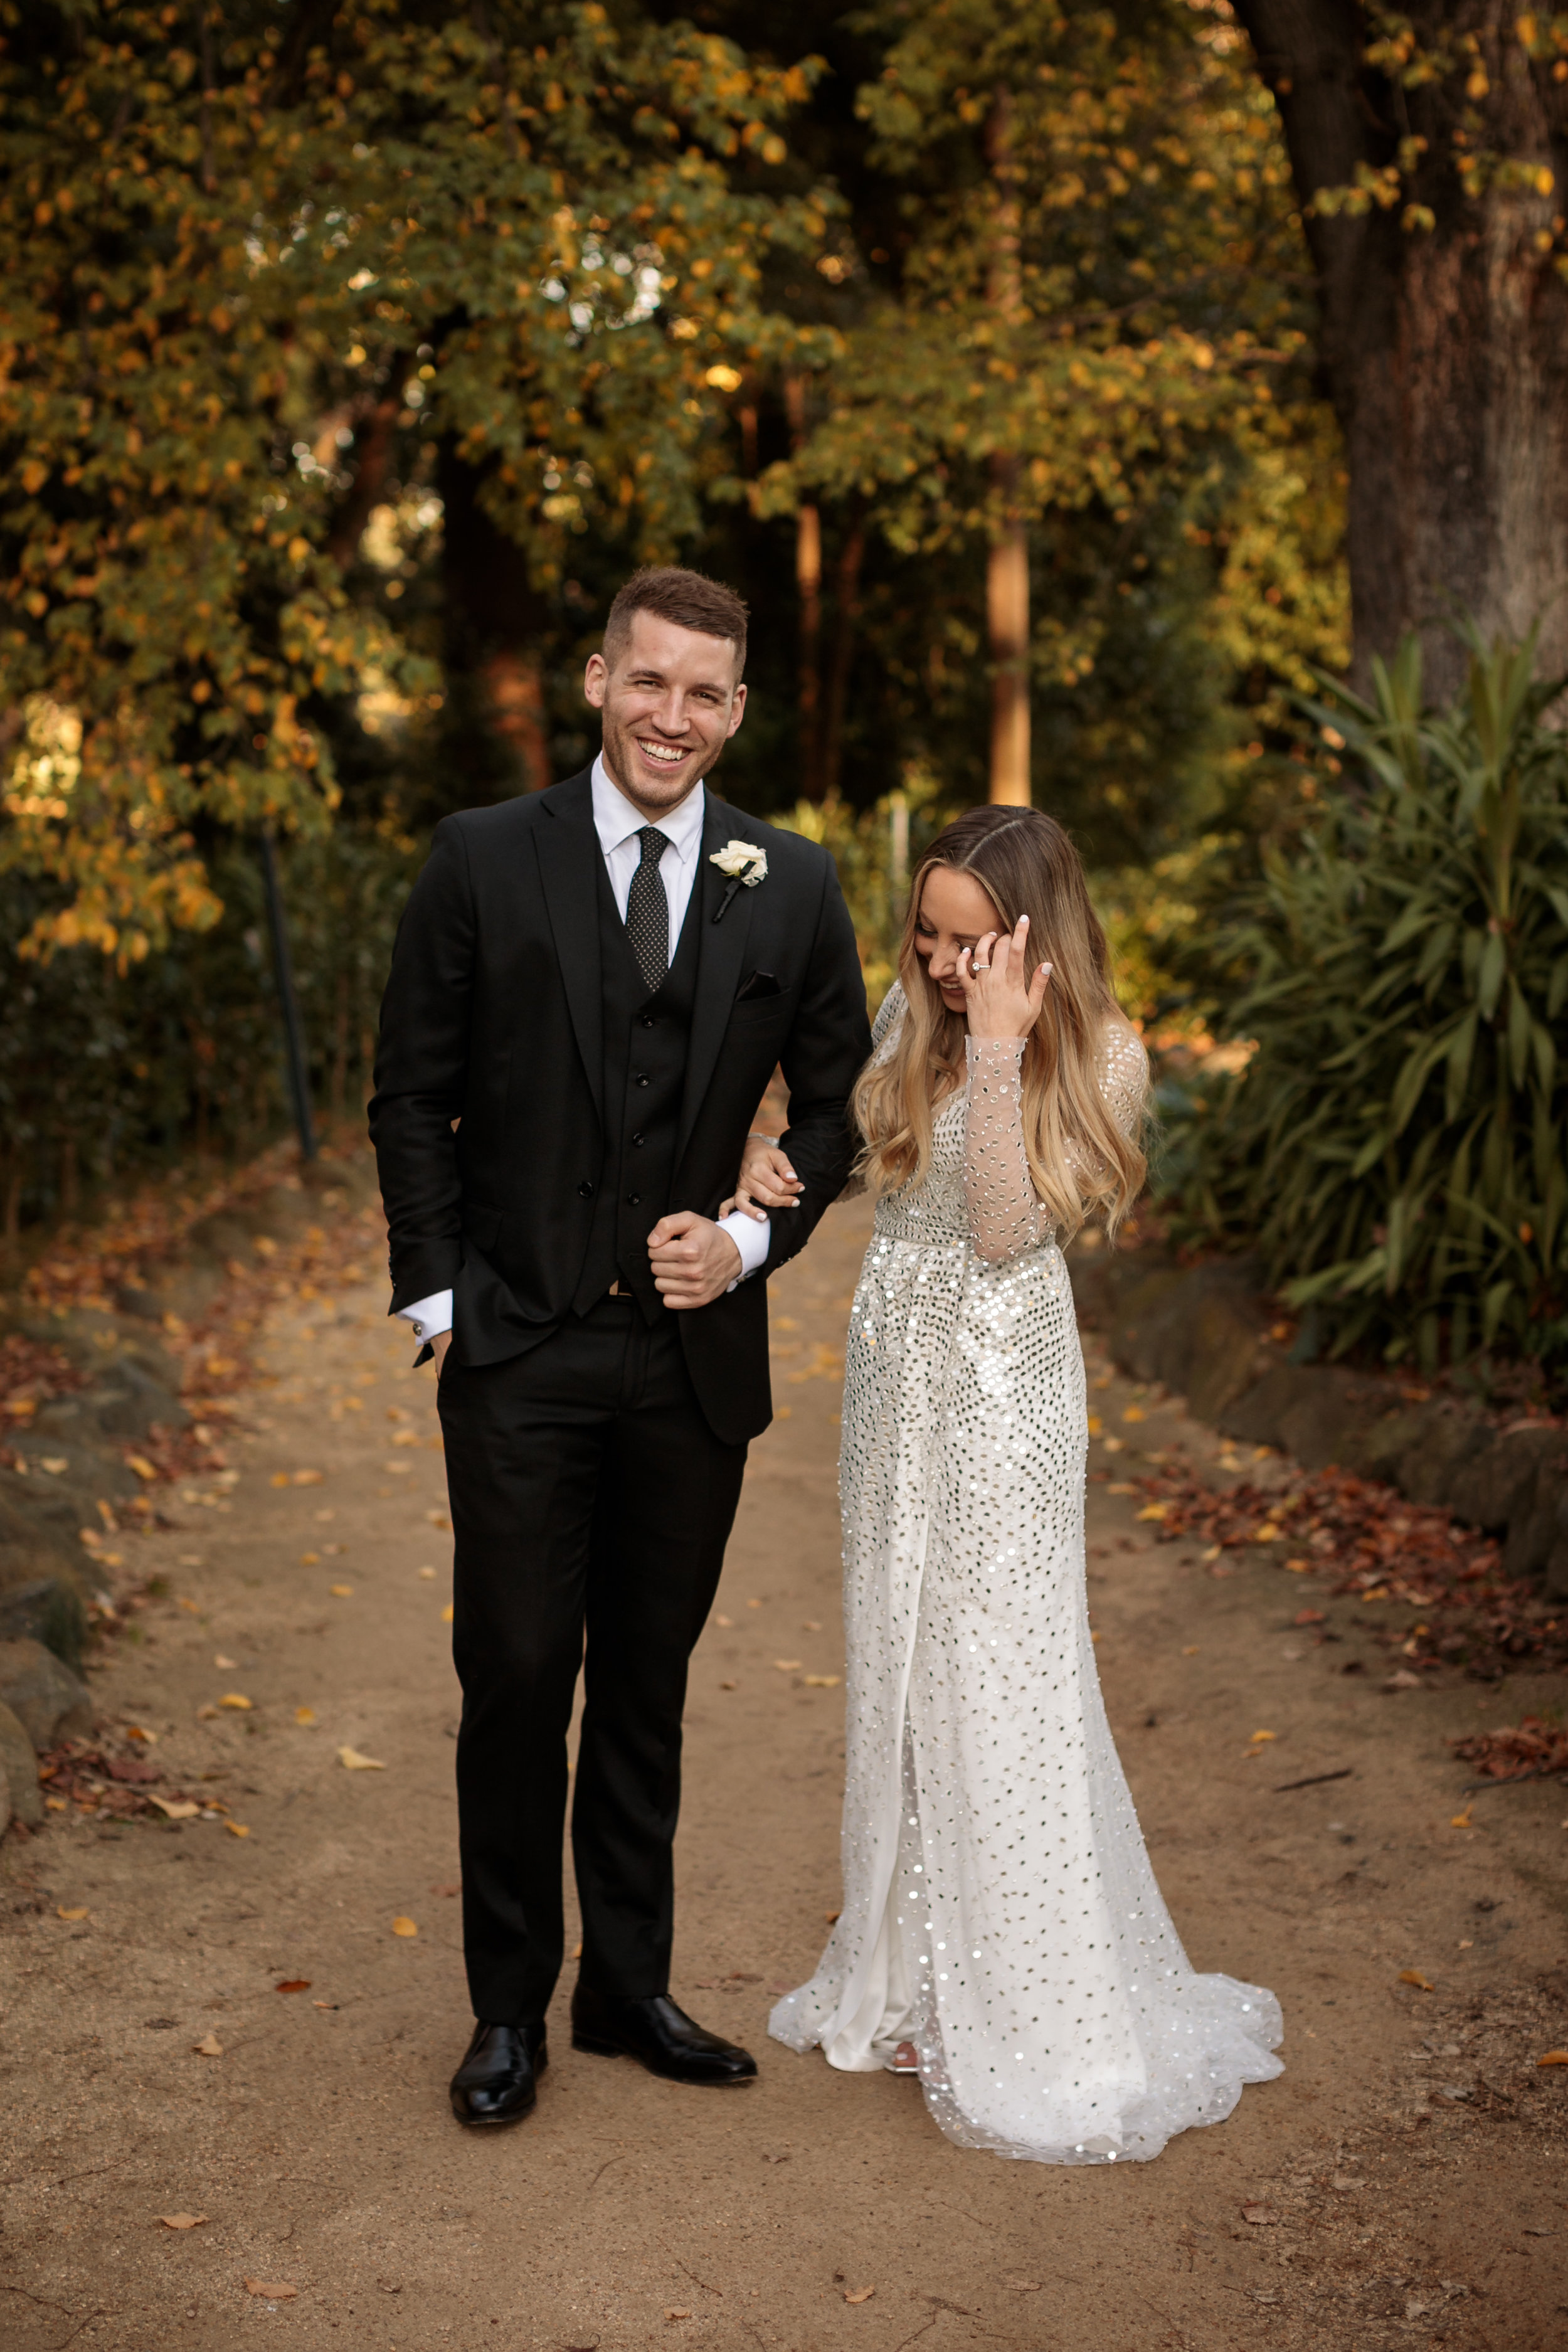 JEREMY-BLODE-Liza + James Wedding Highlights-47.jpg